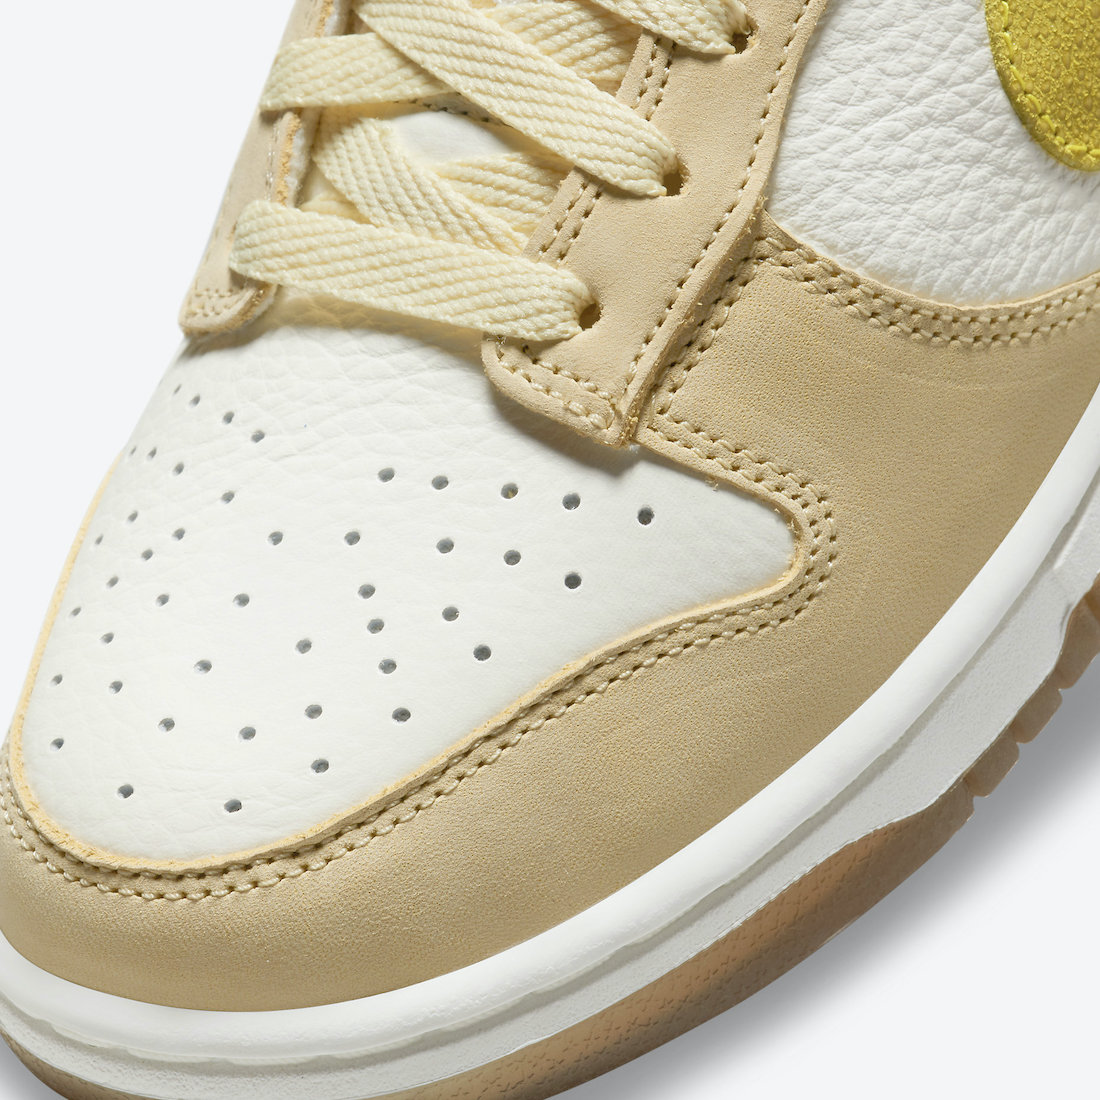 Nike Dunk Low 'Lemon Drop' DJ6902-700 6